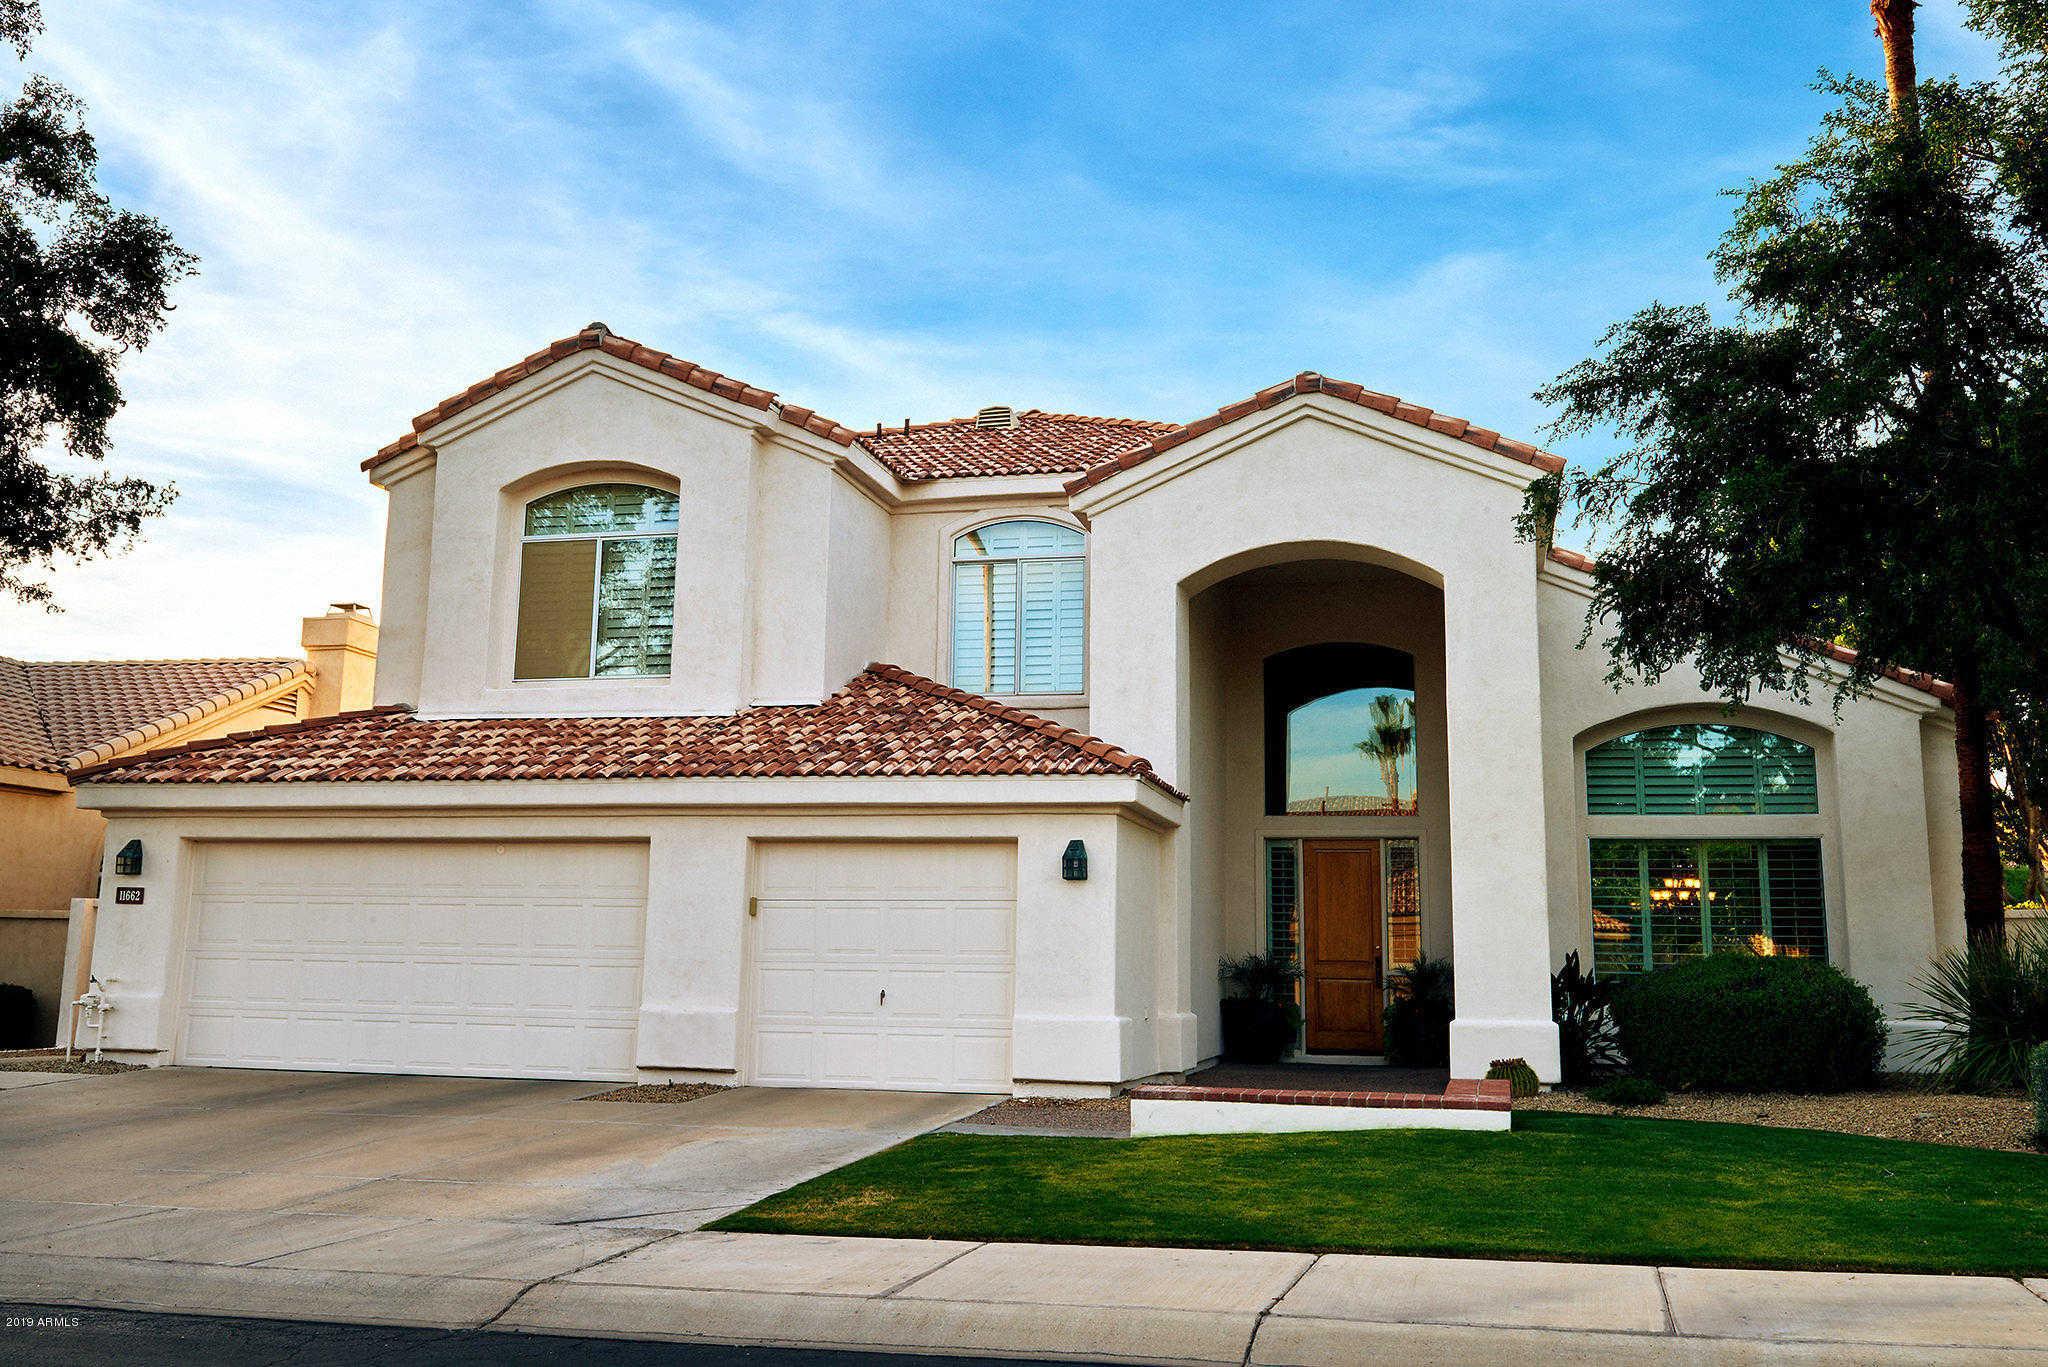 $652,000 - 4Br/3Ba - Home for Sale in Parcel 4 At Stonegate, Scottsdale